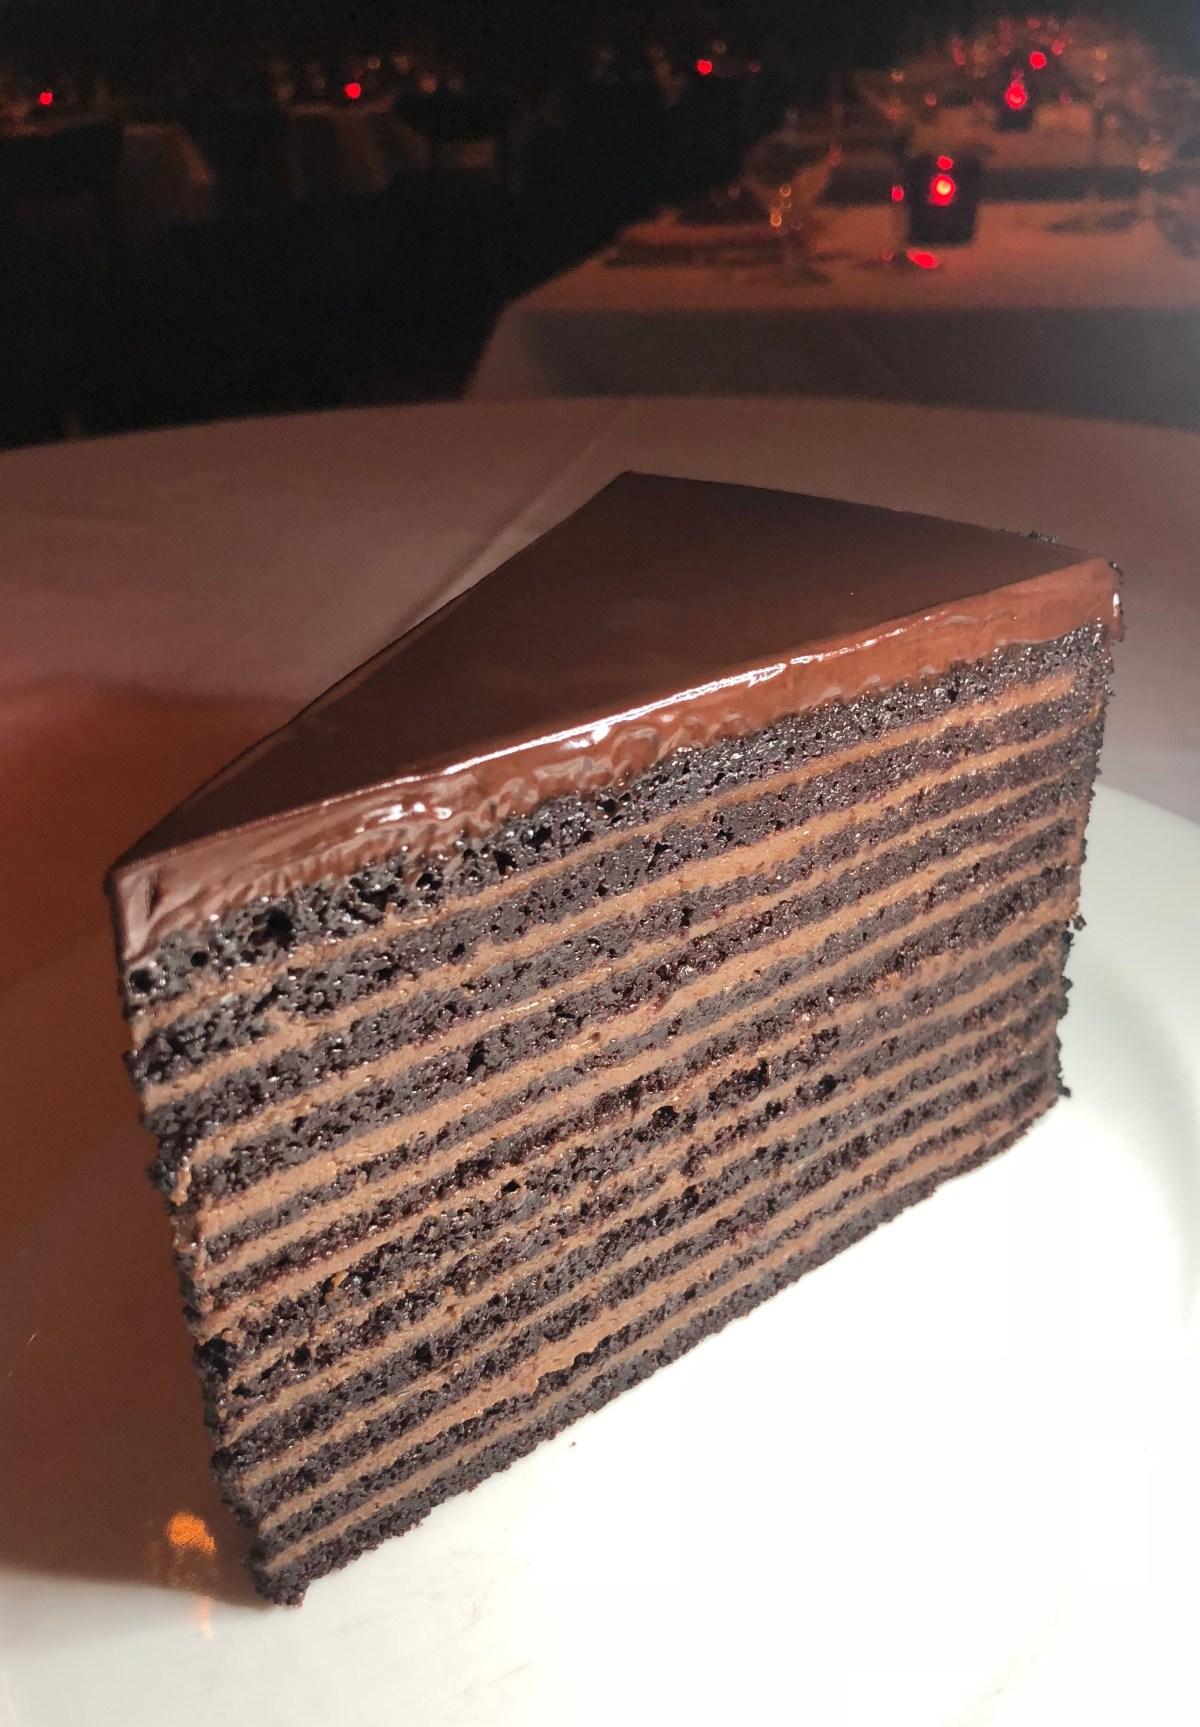 24 Layer Chocolate Cake | Strip House at Planet Hollywood #24layercake #bestdessertsinvegas #bestdessertlasvegas #chocolatecakelasvegas #striphousecake